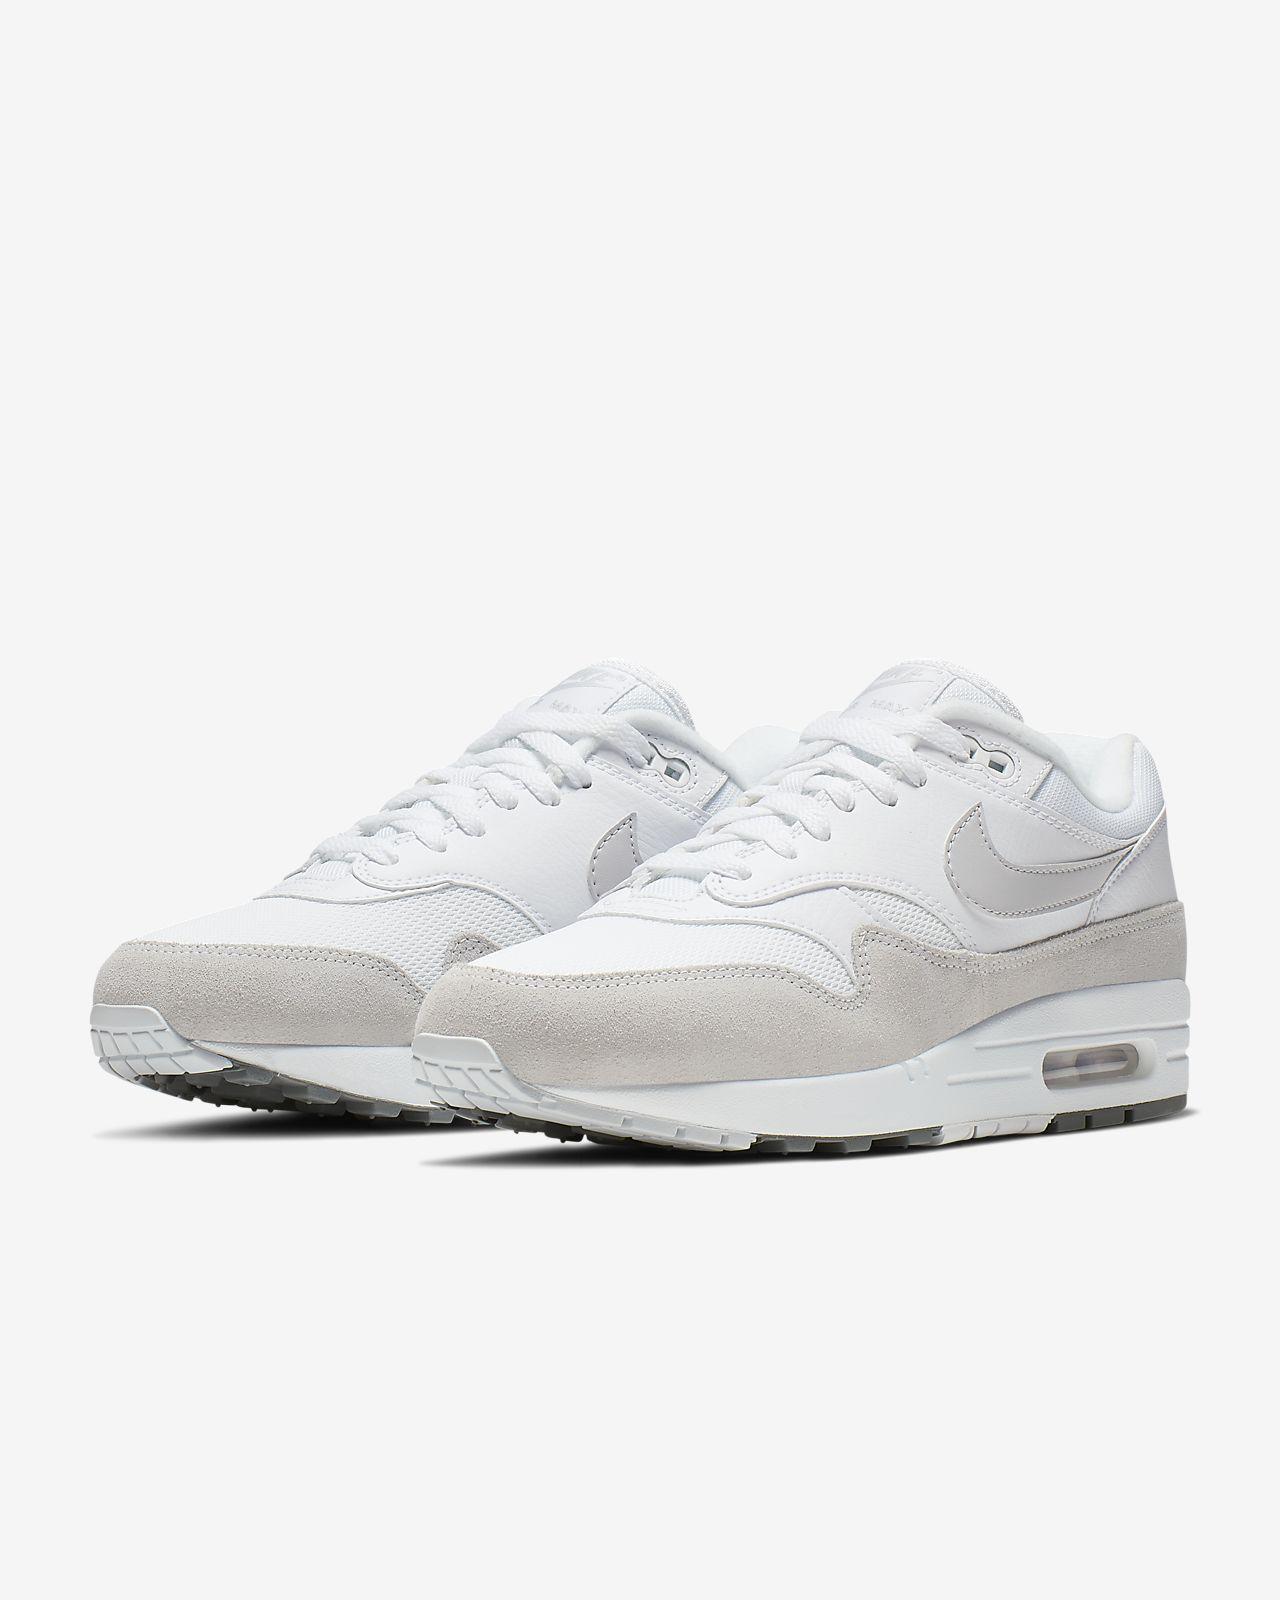 hot sales 80df2 e8cad ... Chaussure Nike Air Max 1 pour Homme